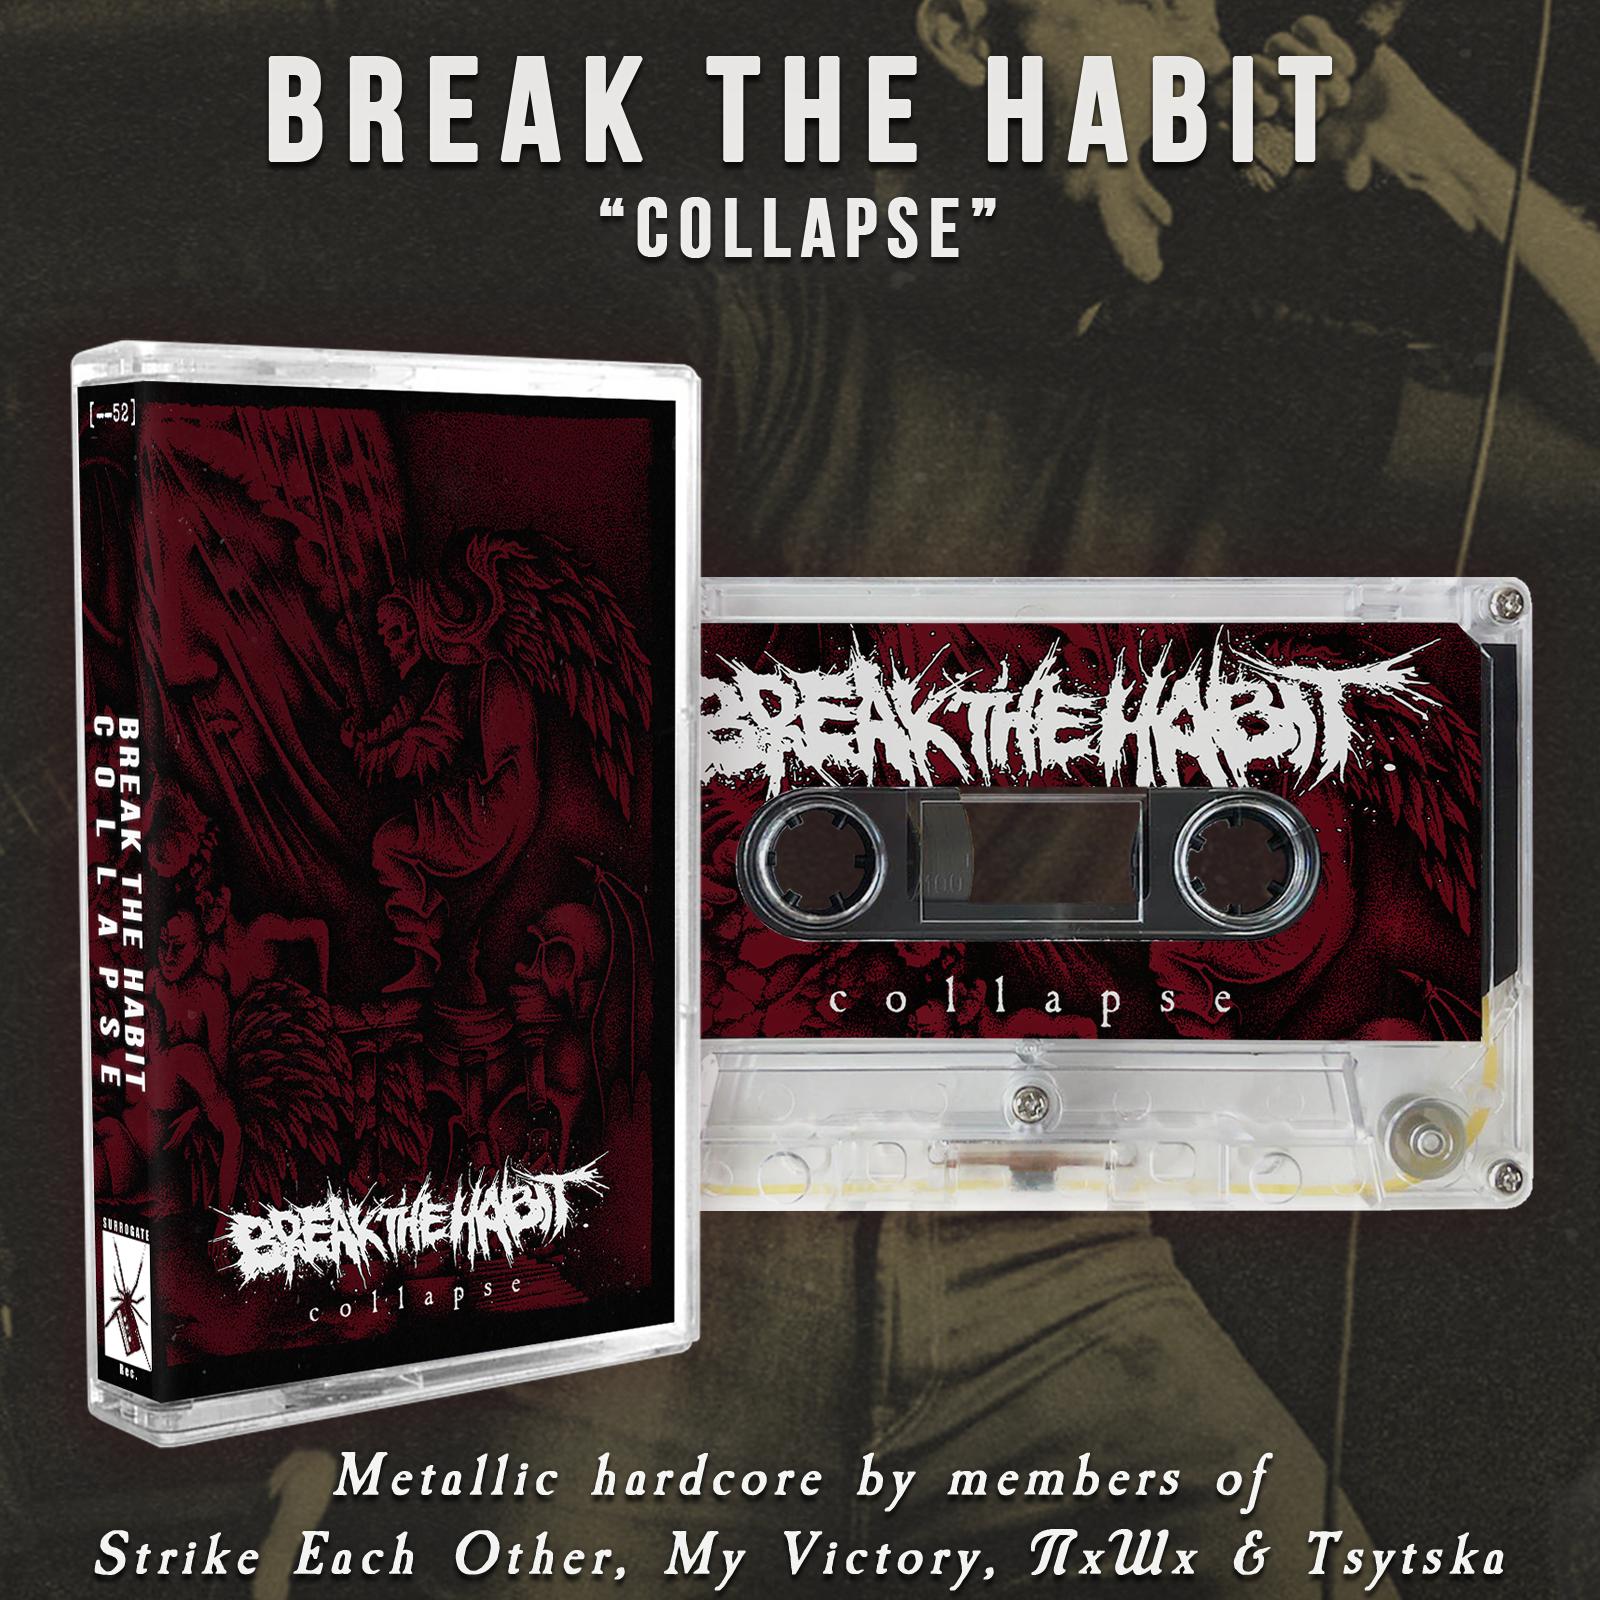 Break The Habit 'Collapse' cassette